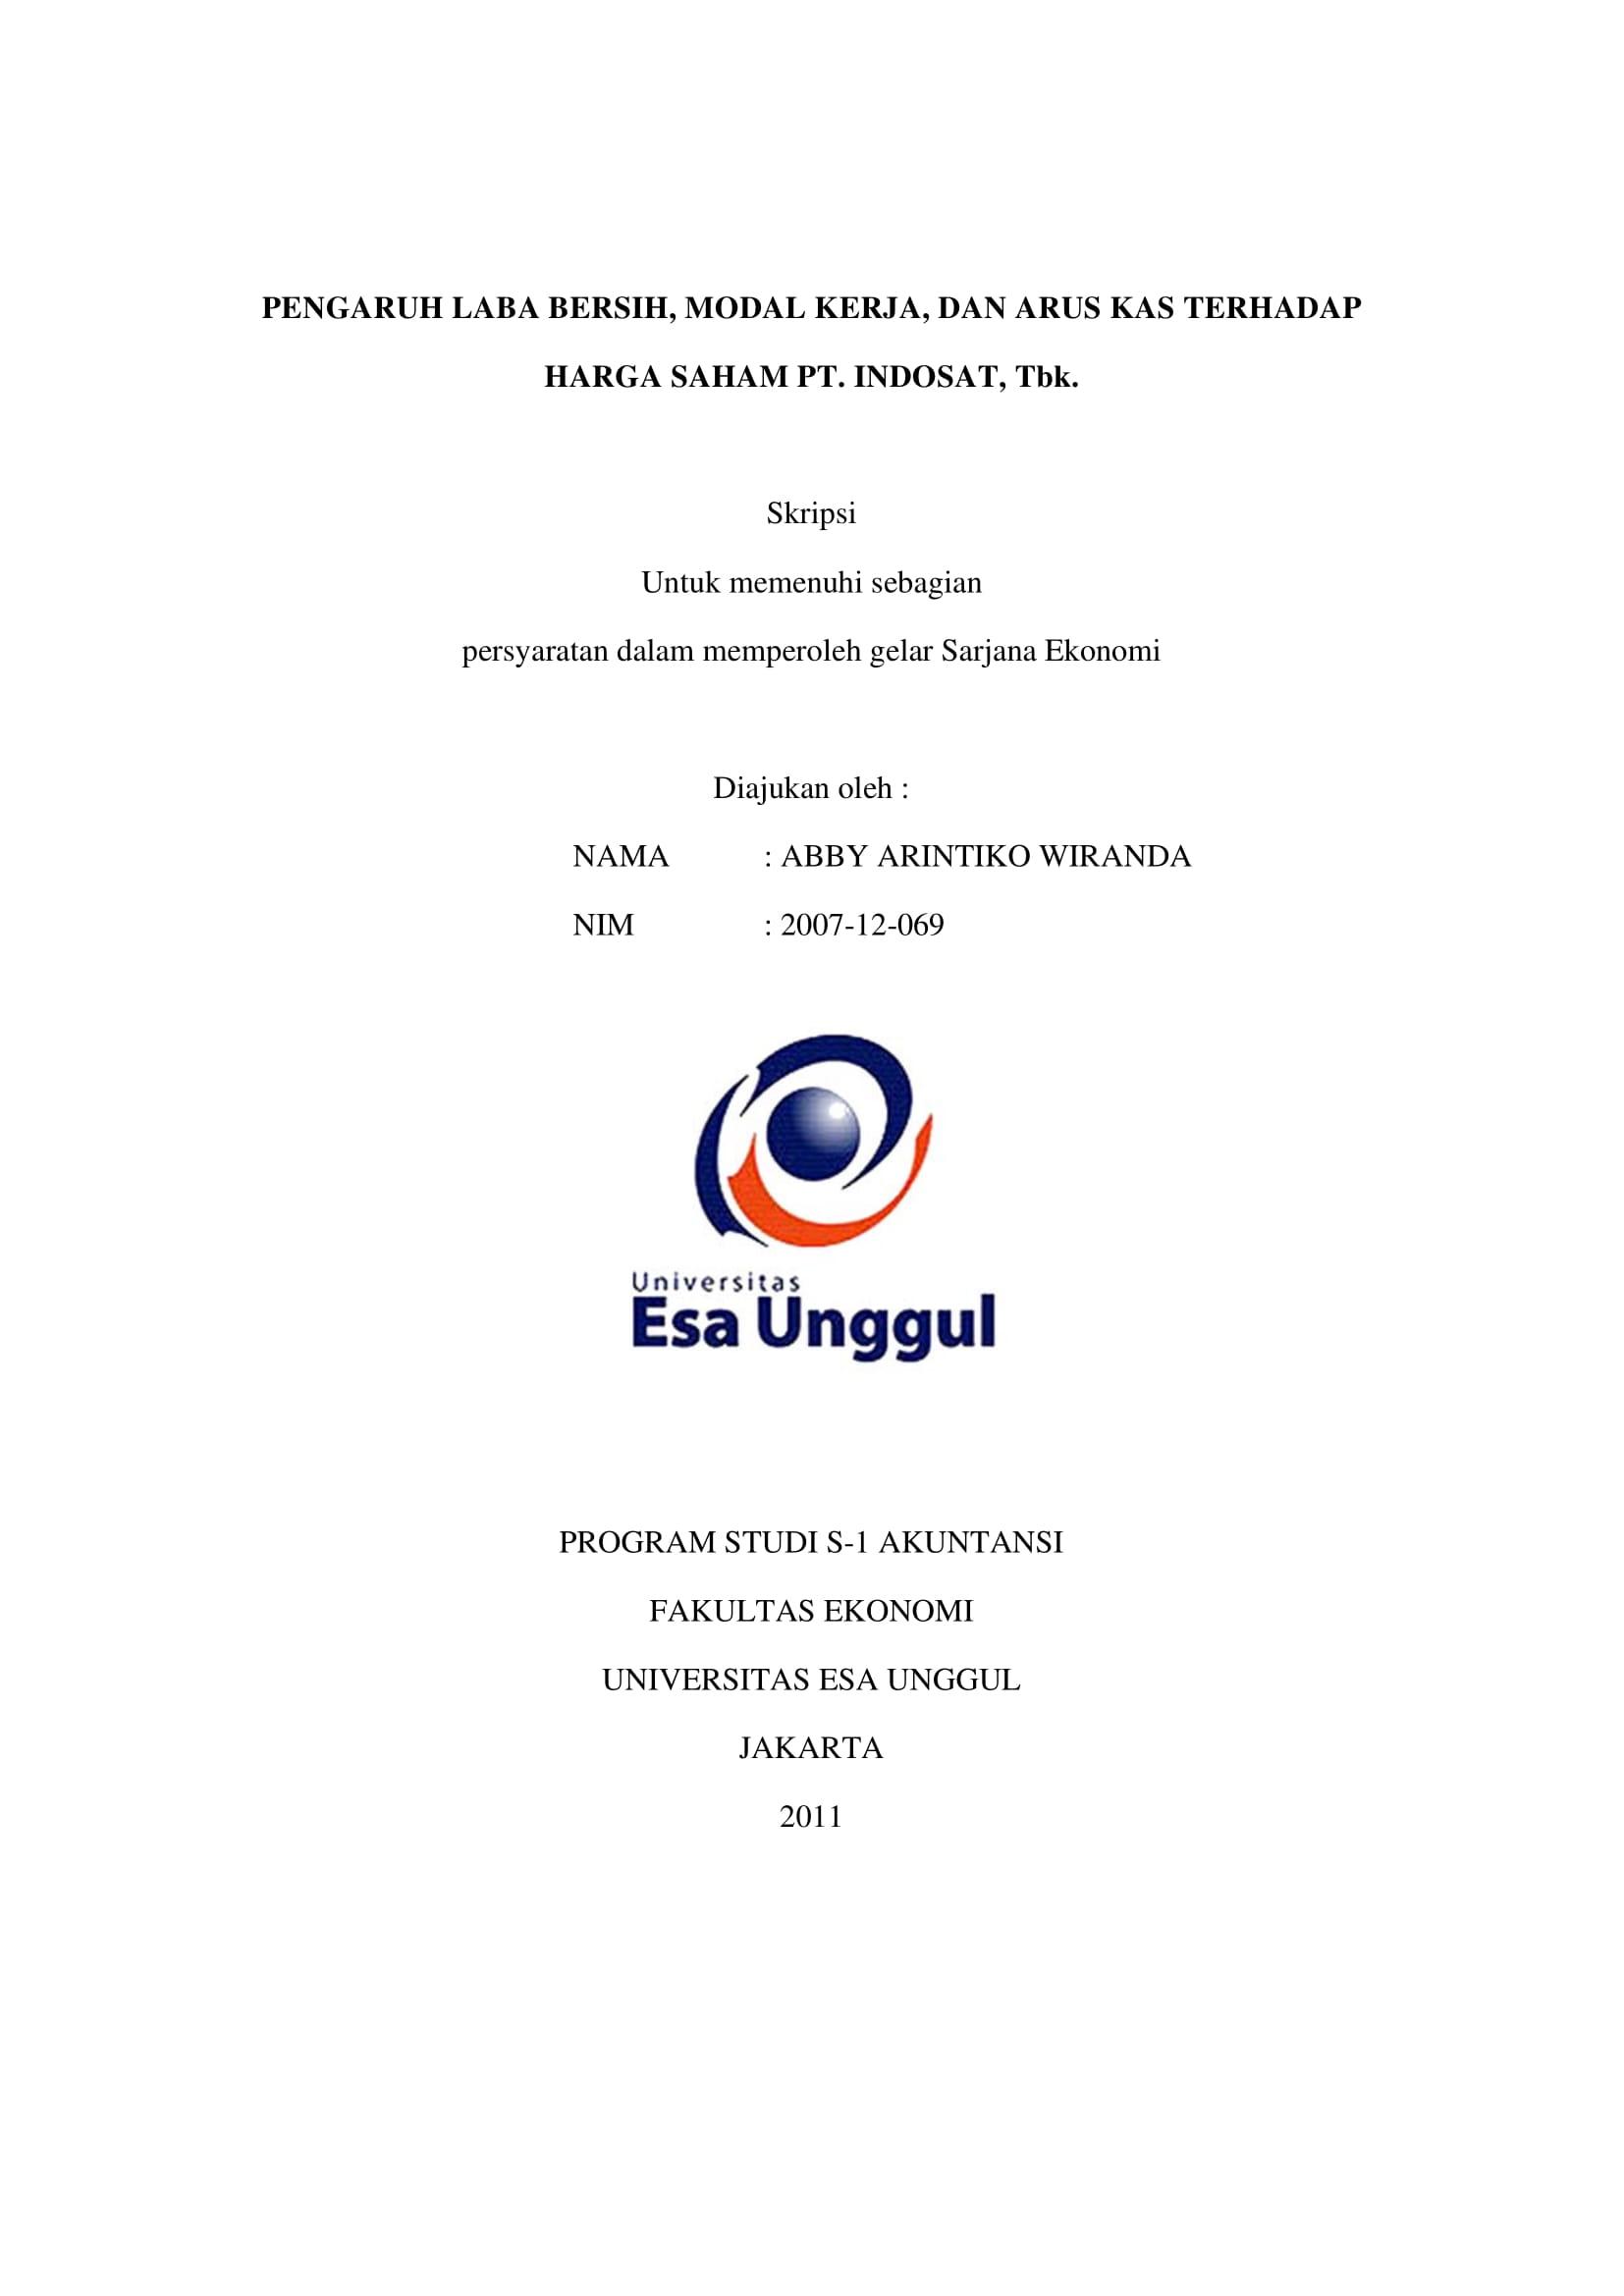 Pengaruh Laba Bersih, Modal Kerja, dan Arus Kas Terhadap Harga Saham PT. Indosat, Tbk.